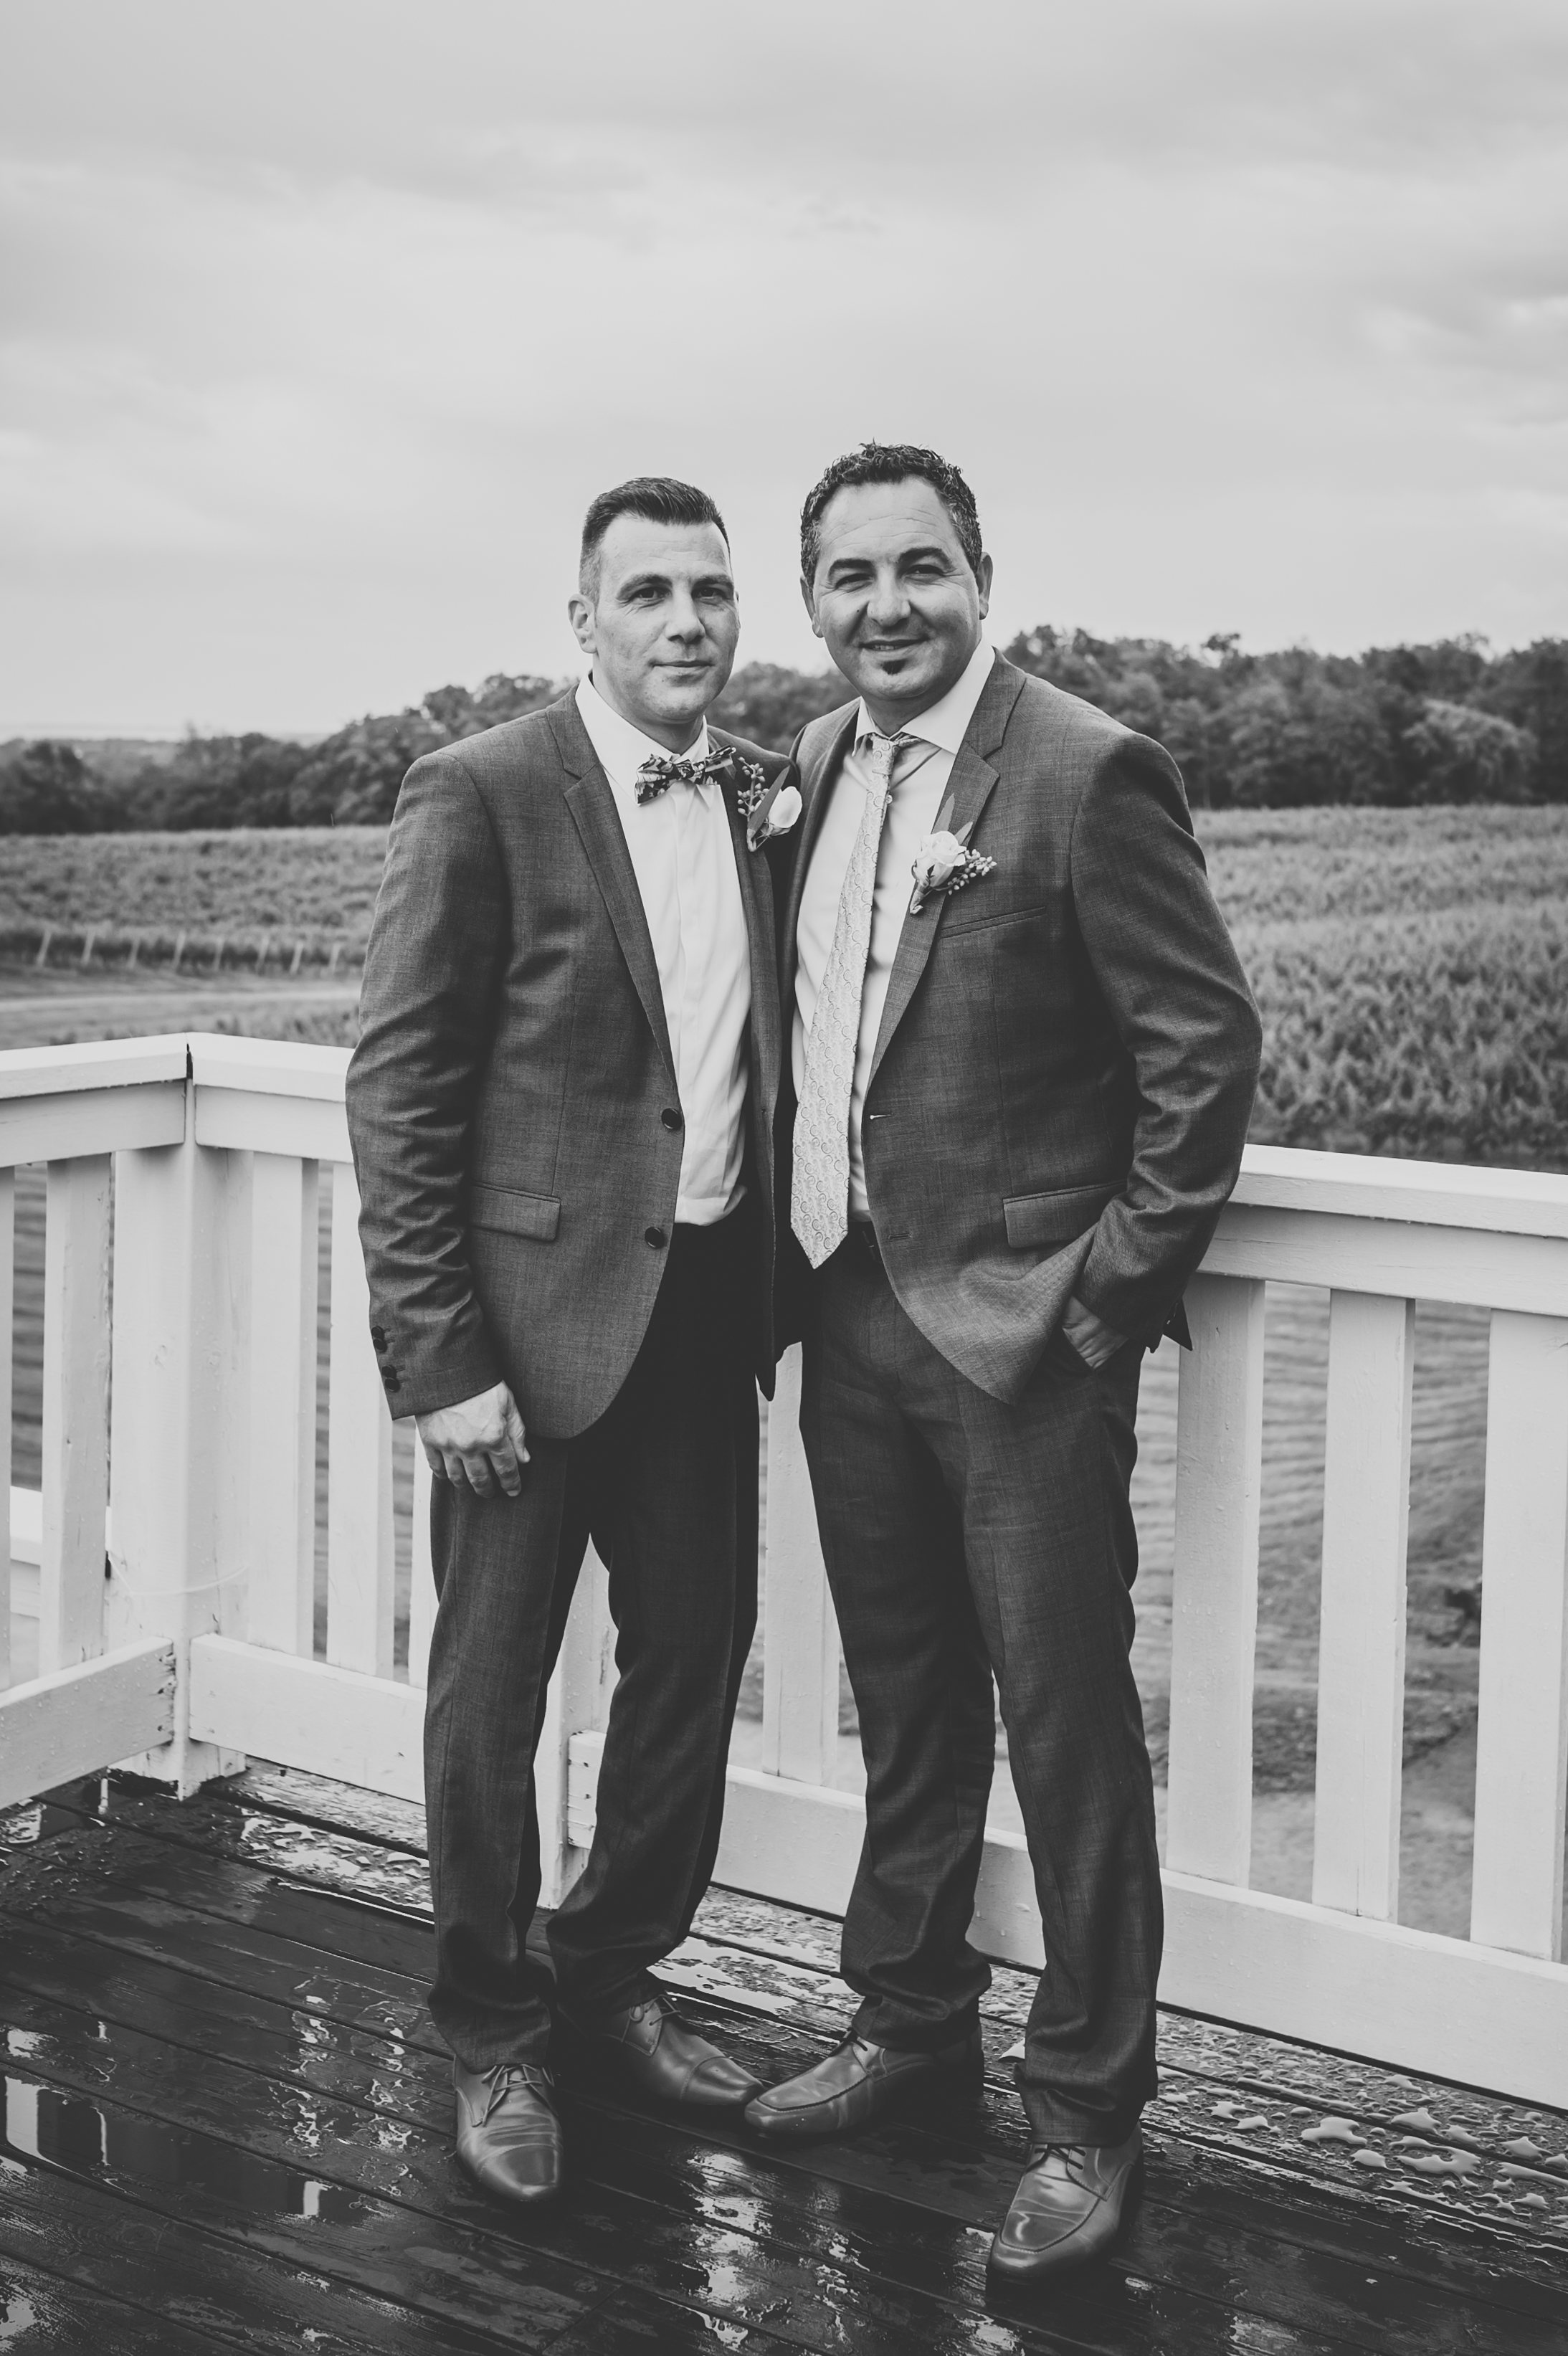 wedding, burlington wedding photographer,love, lifestyle photography,toronto wedding photographer,groom, vineland estetes winery,best man